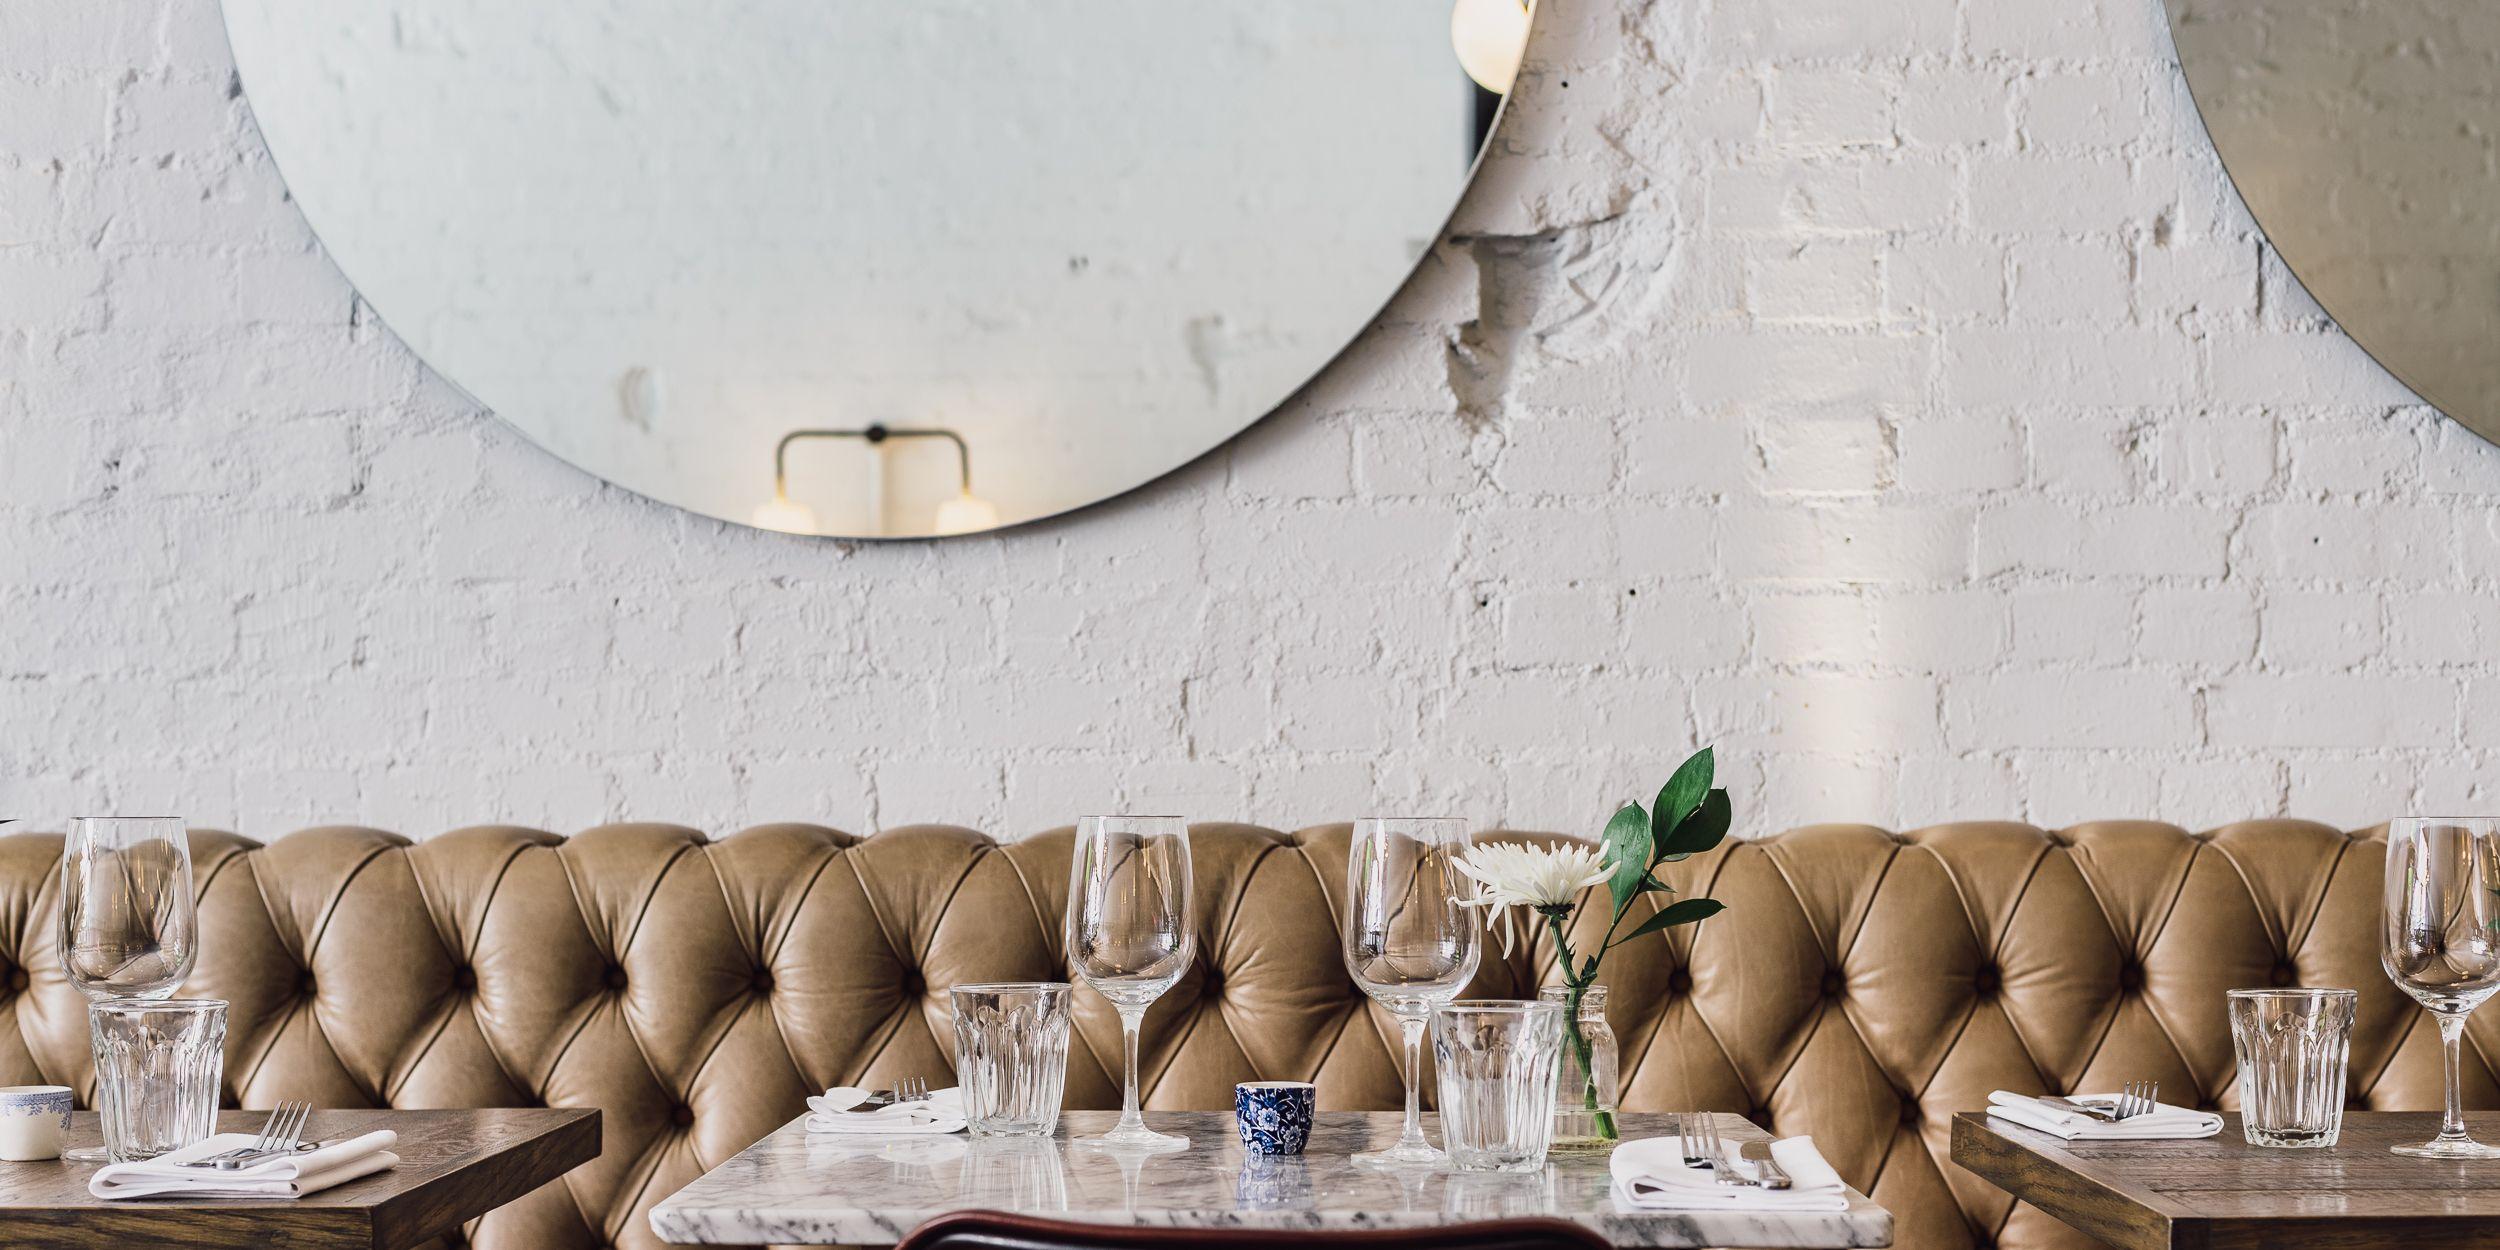 hotspots-londen-restaurants-brunch